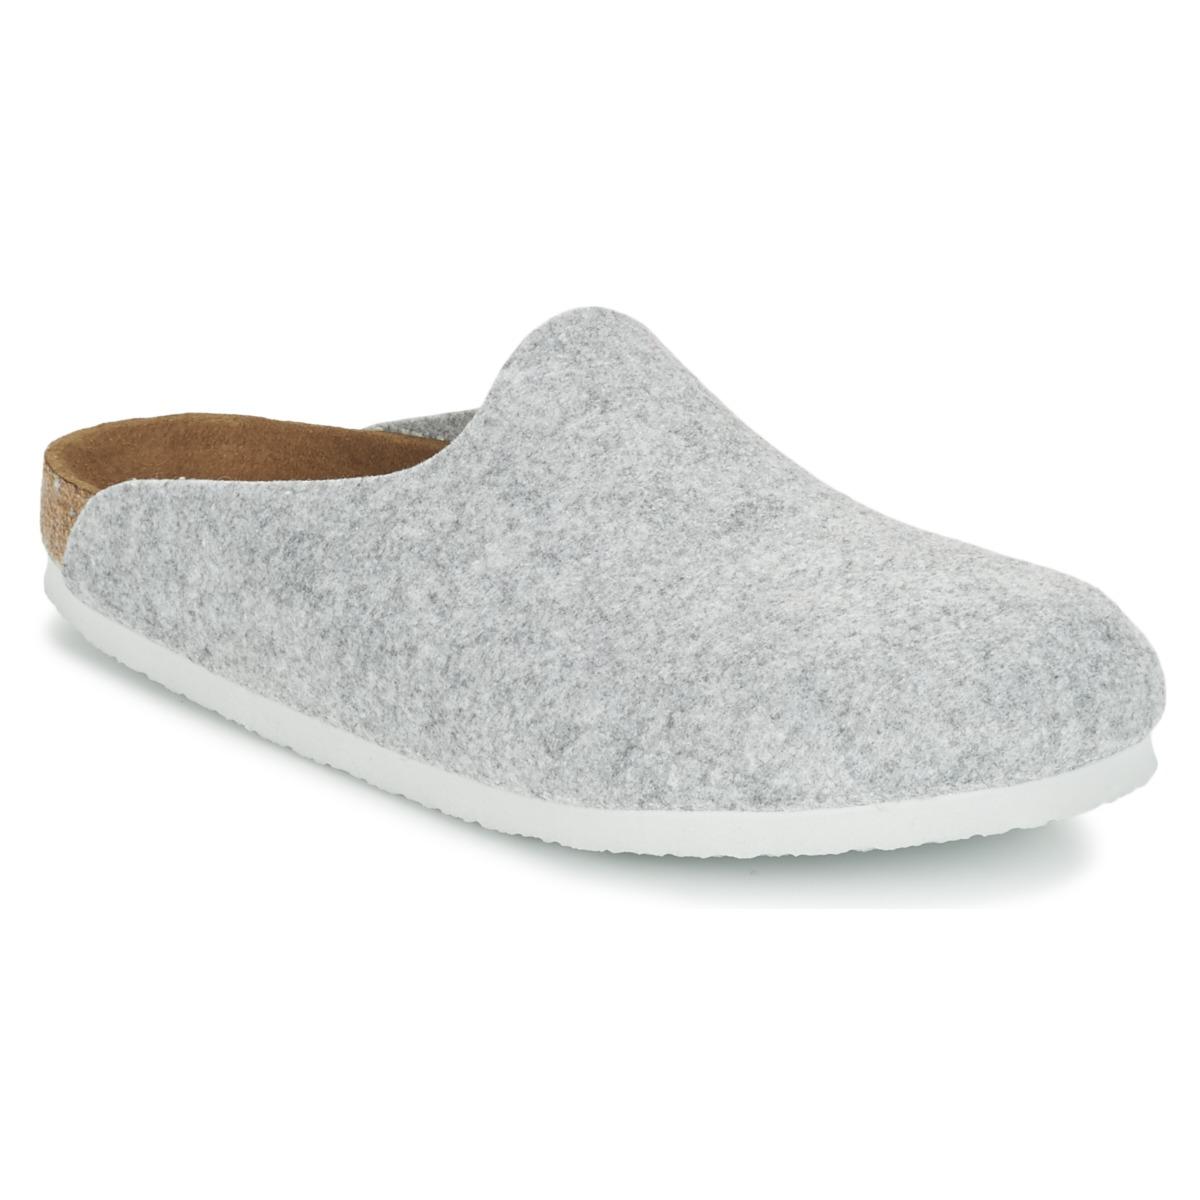 Birkenstock AMSTERDAM Grau - Kostenloser Versand bei Spartoode ! - Schuhe Pantoletten / Clogs Damen 47,99 €